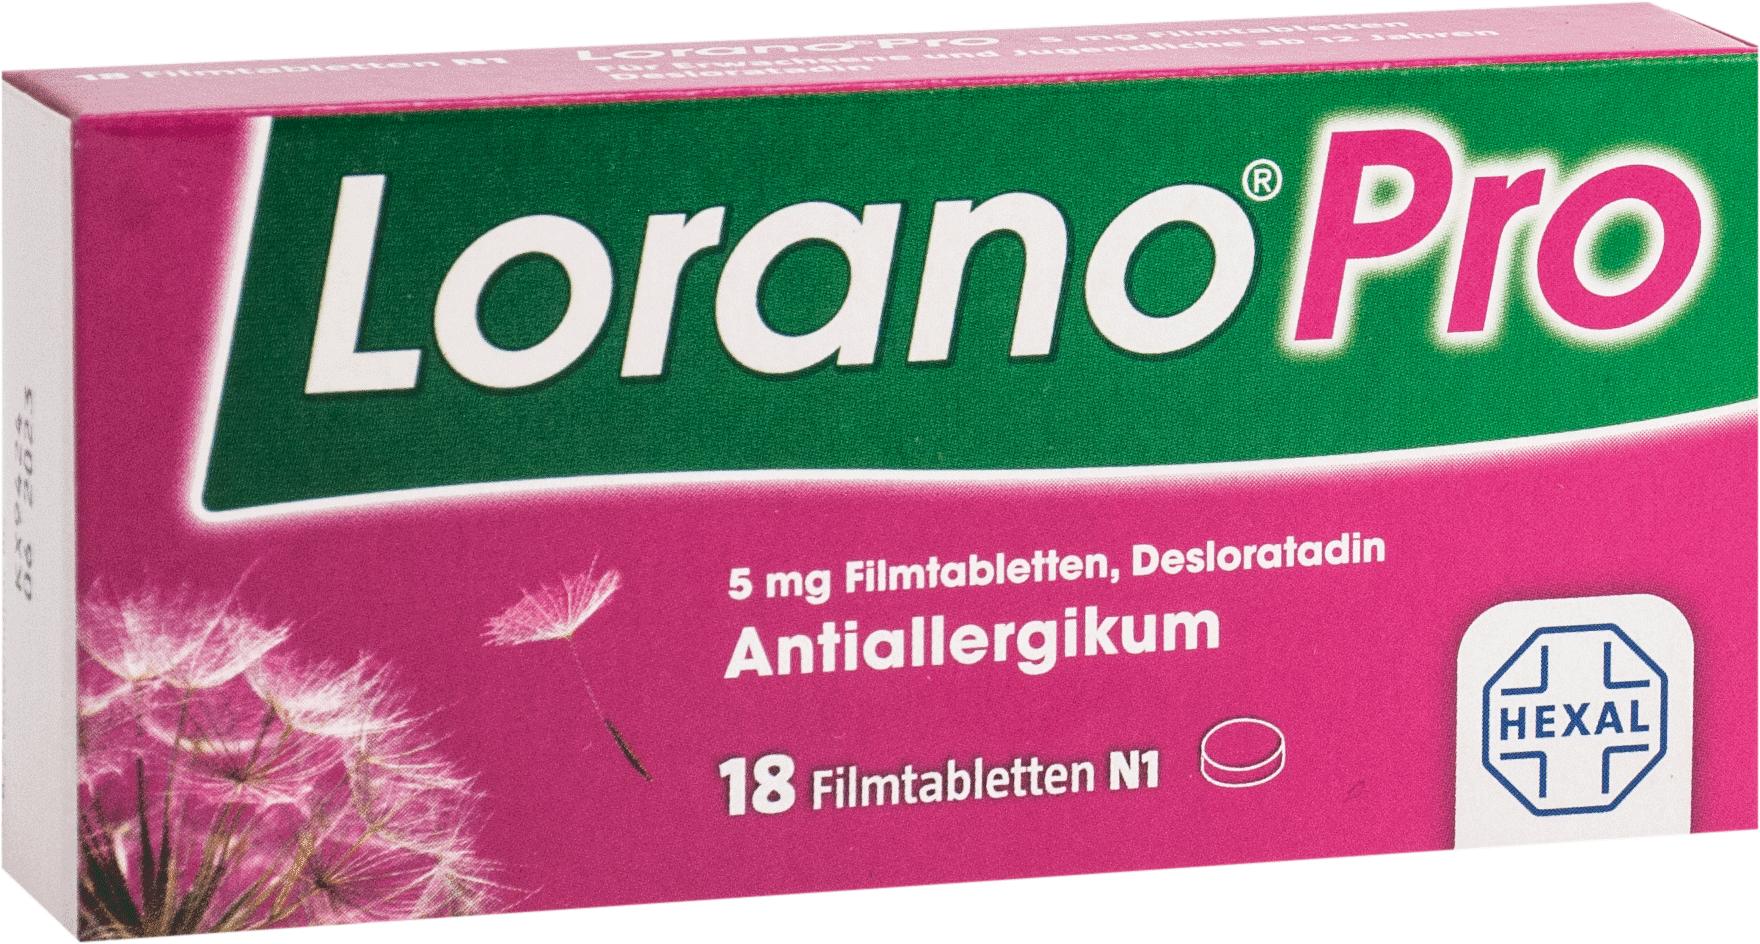 LoranoPro 5mg Filmtabletten